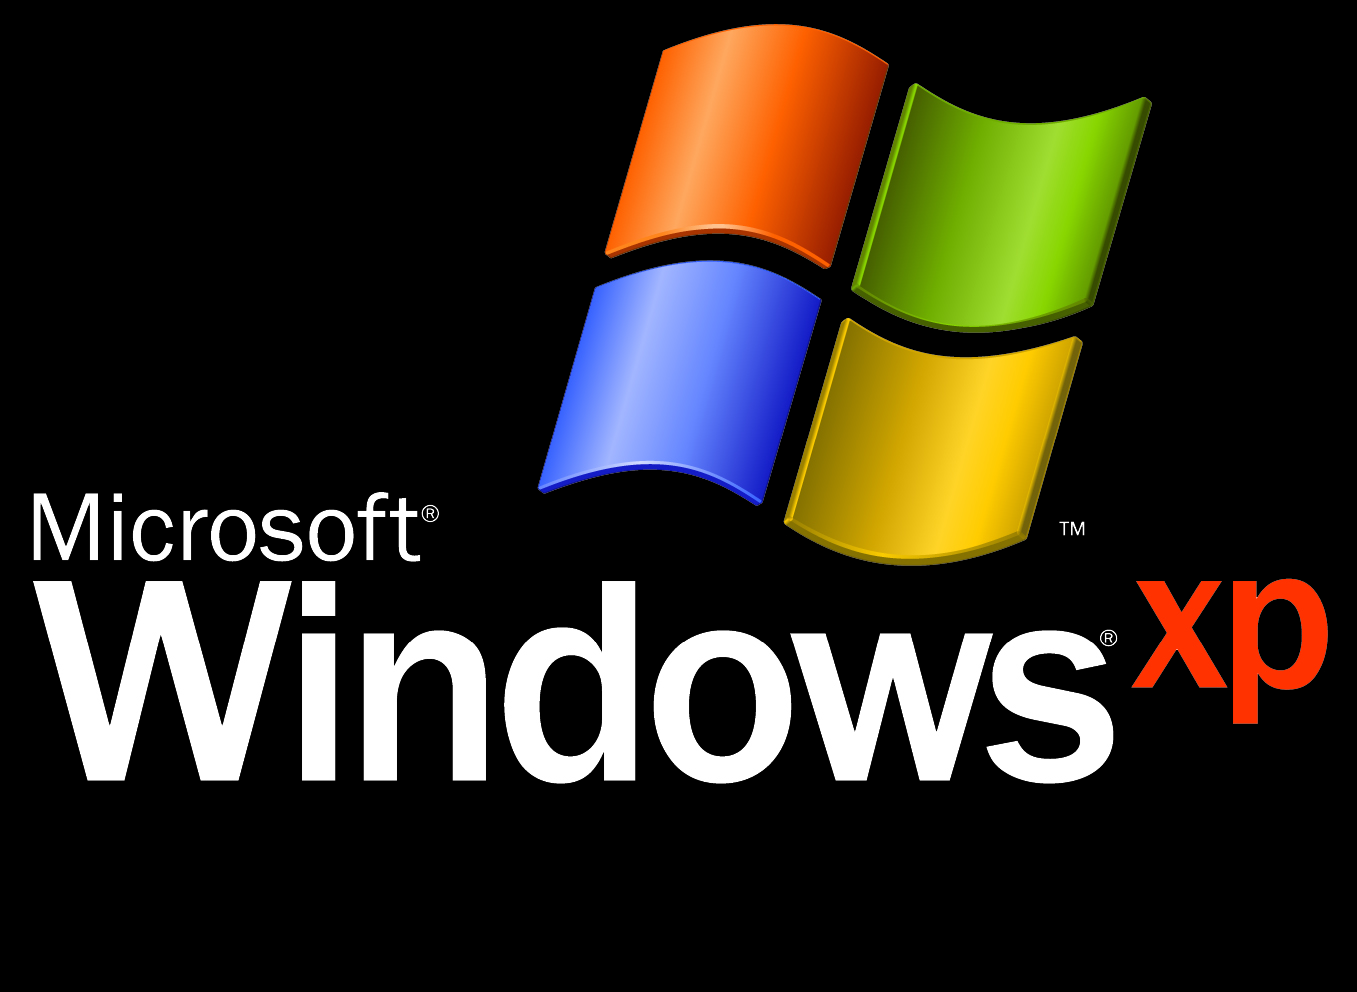 Windows XP logo 2.